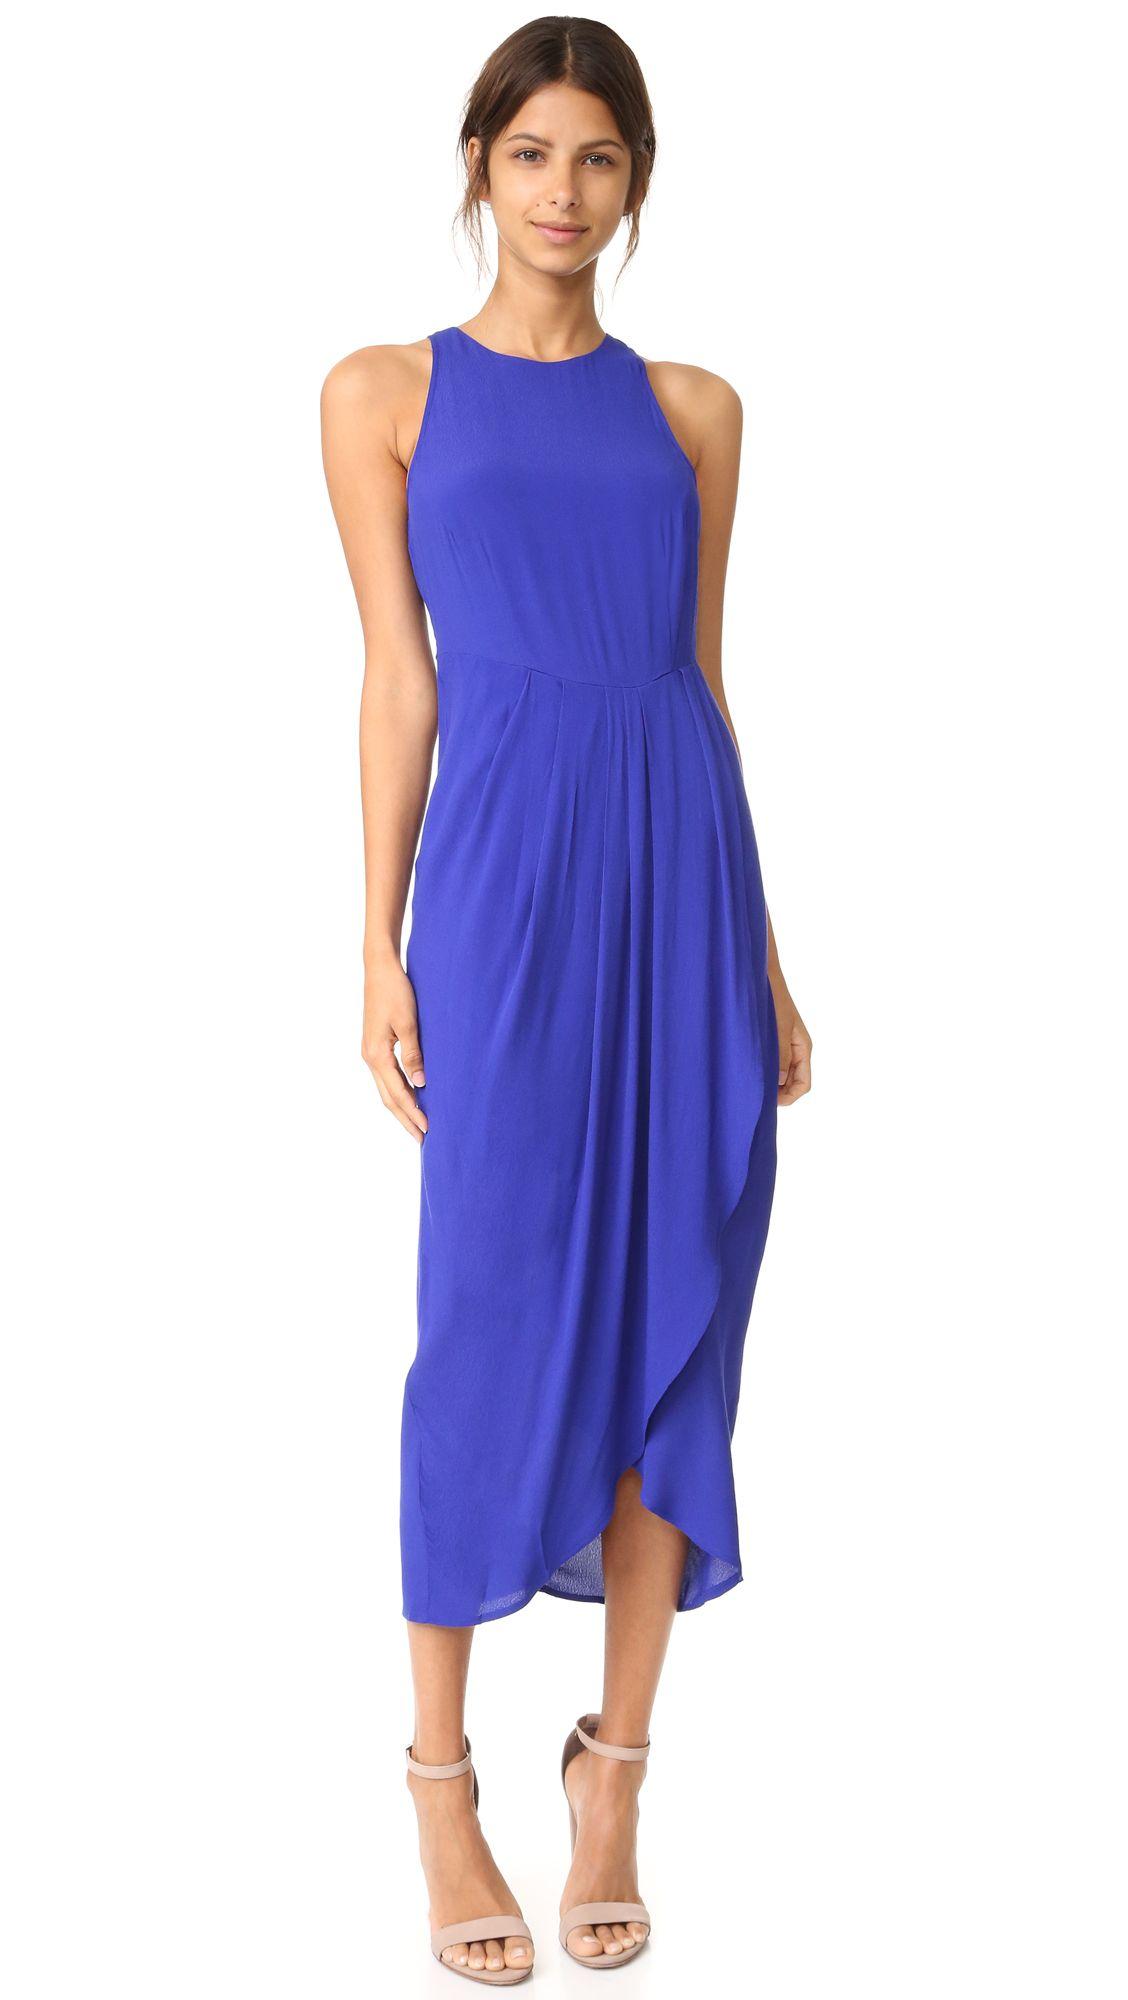 8e0a4b691d0b8 So Social Maxi Dress | Wishlist | Social dresses, Dresses ...